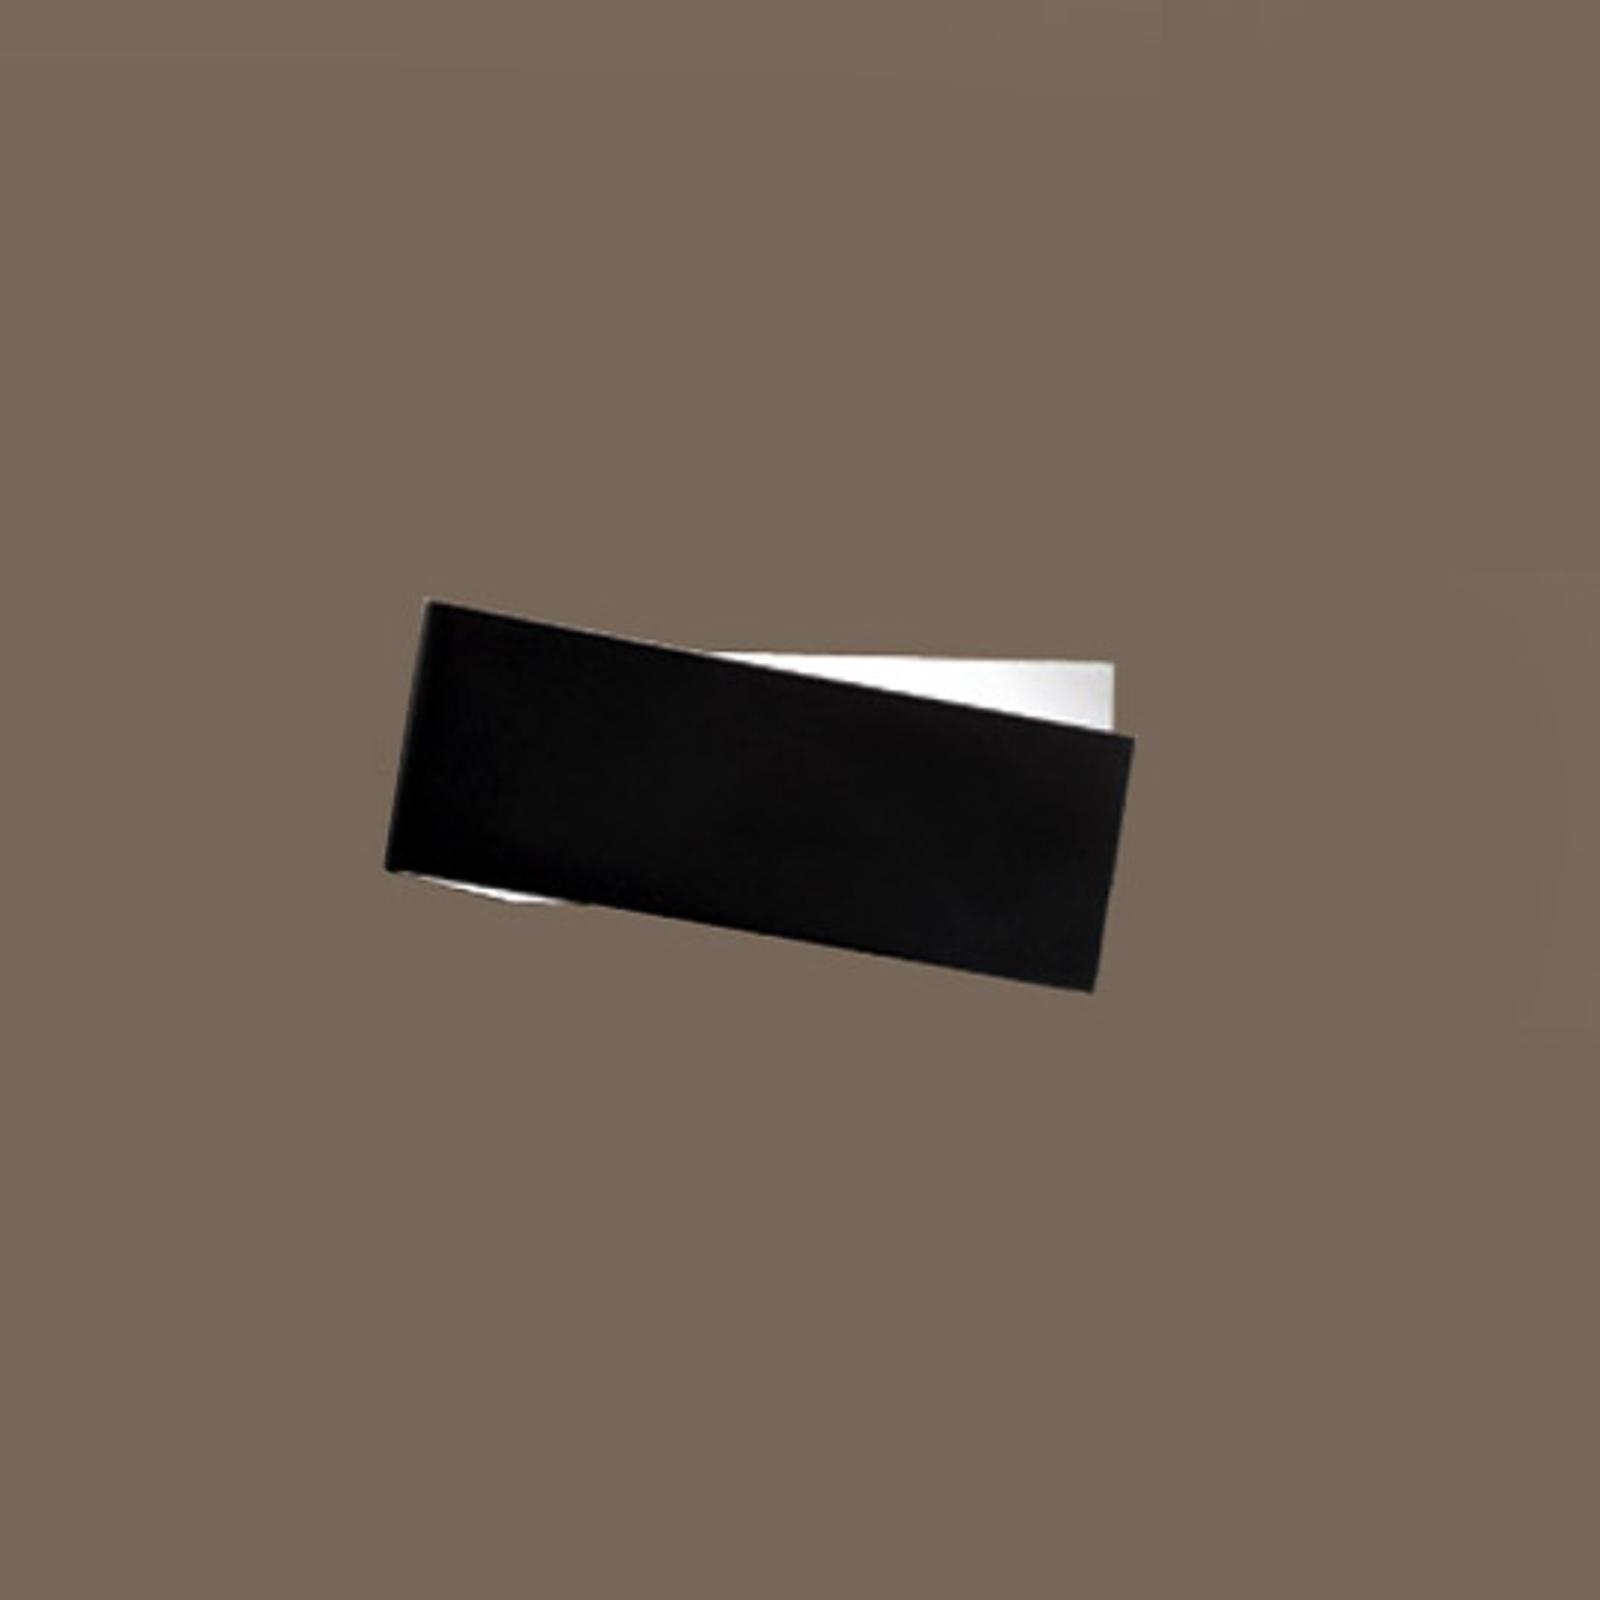 Opvallende wandlamp Zig Zag in zwart-wit, 26 cm